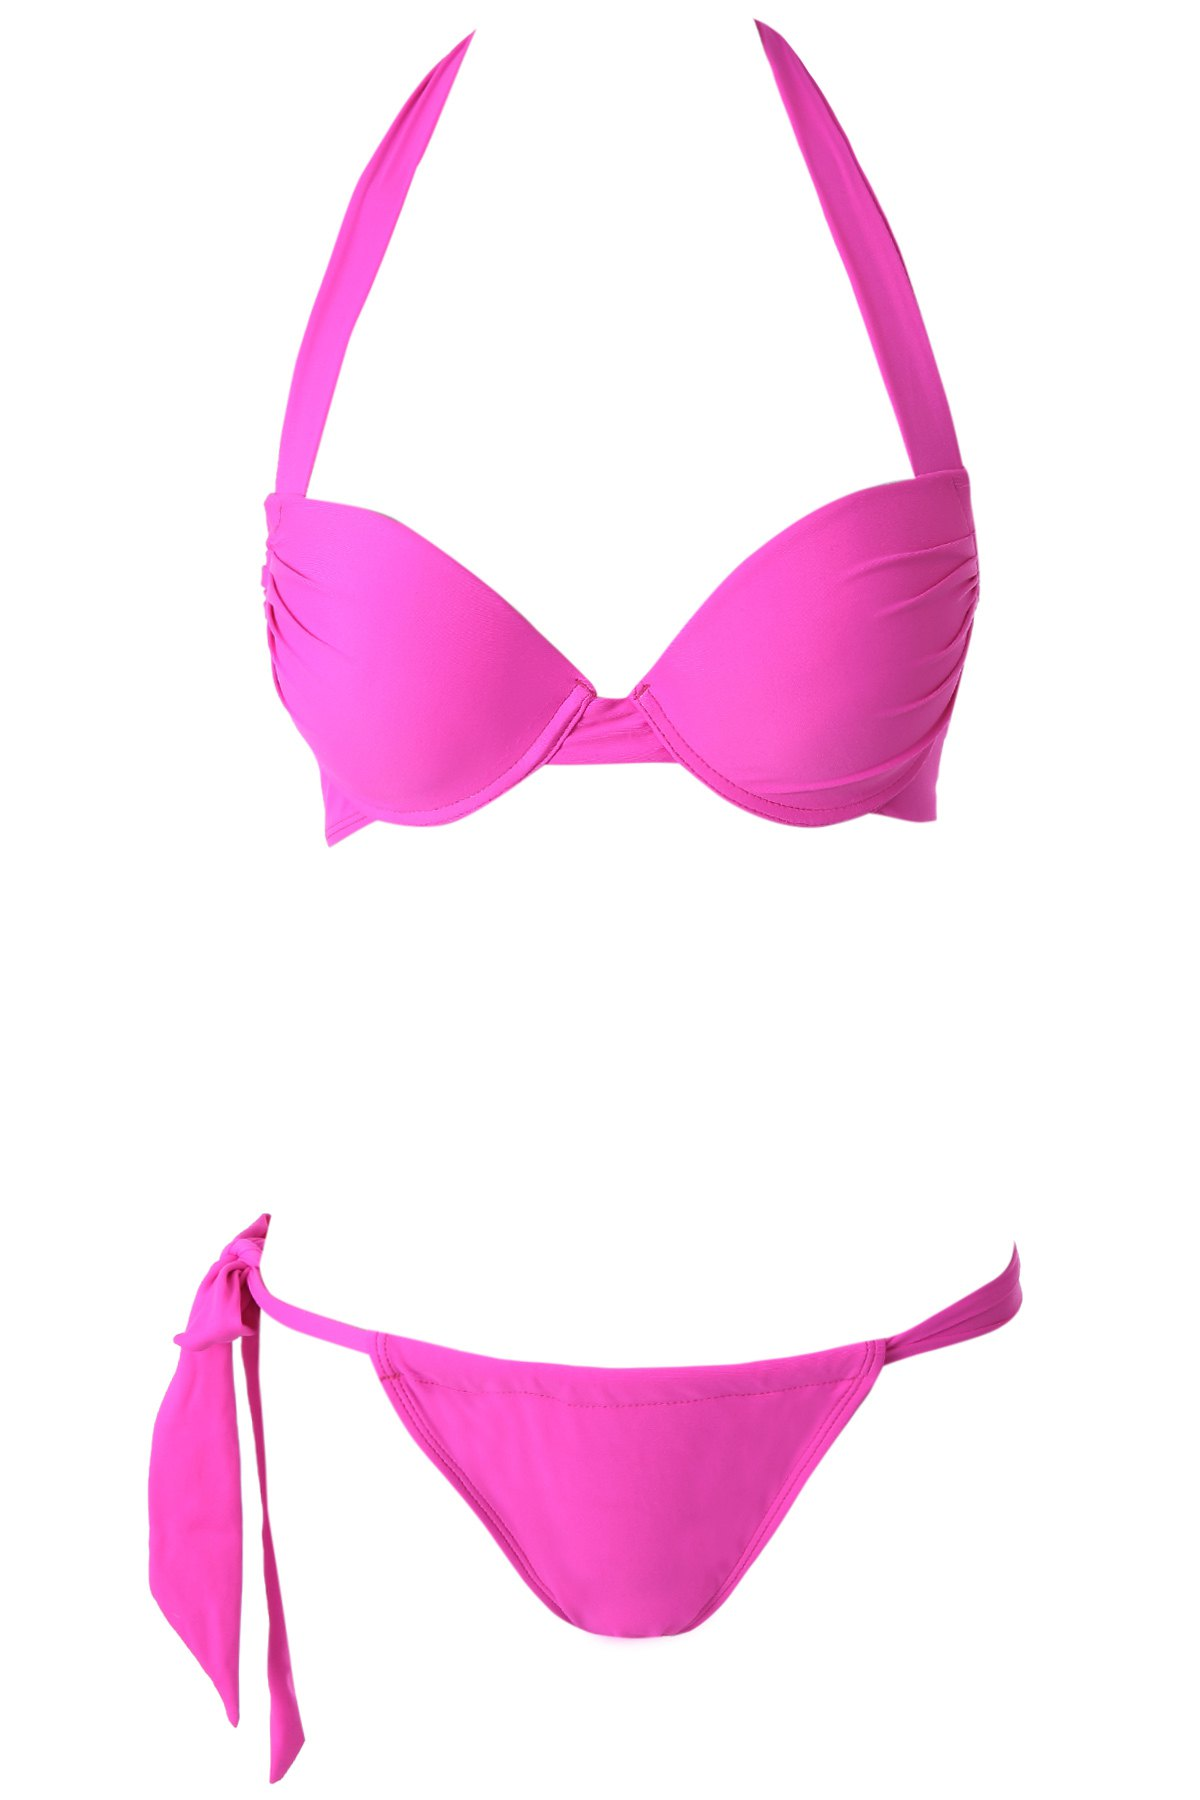 Solid Color Push-Up Halter Bikini Set - PLUM S